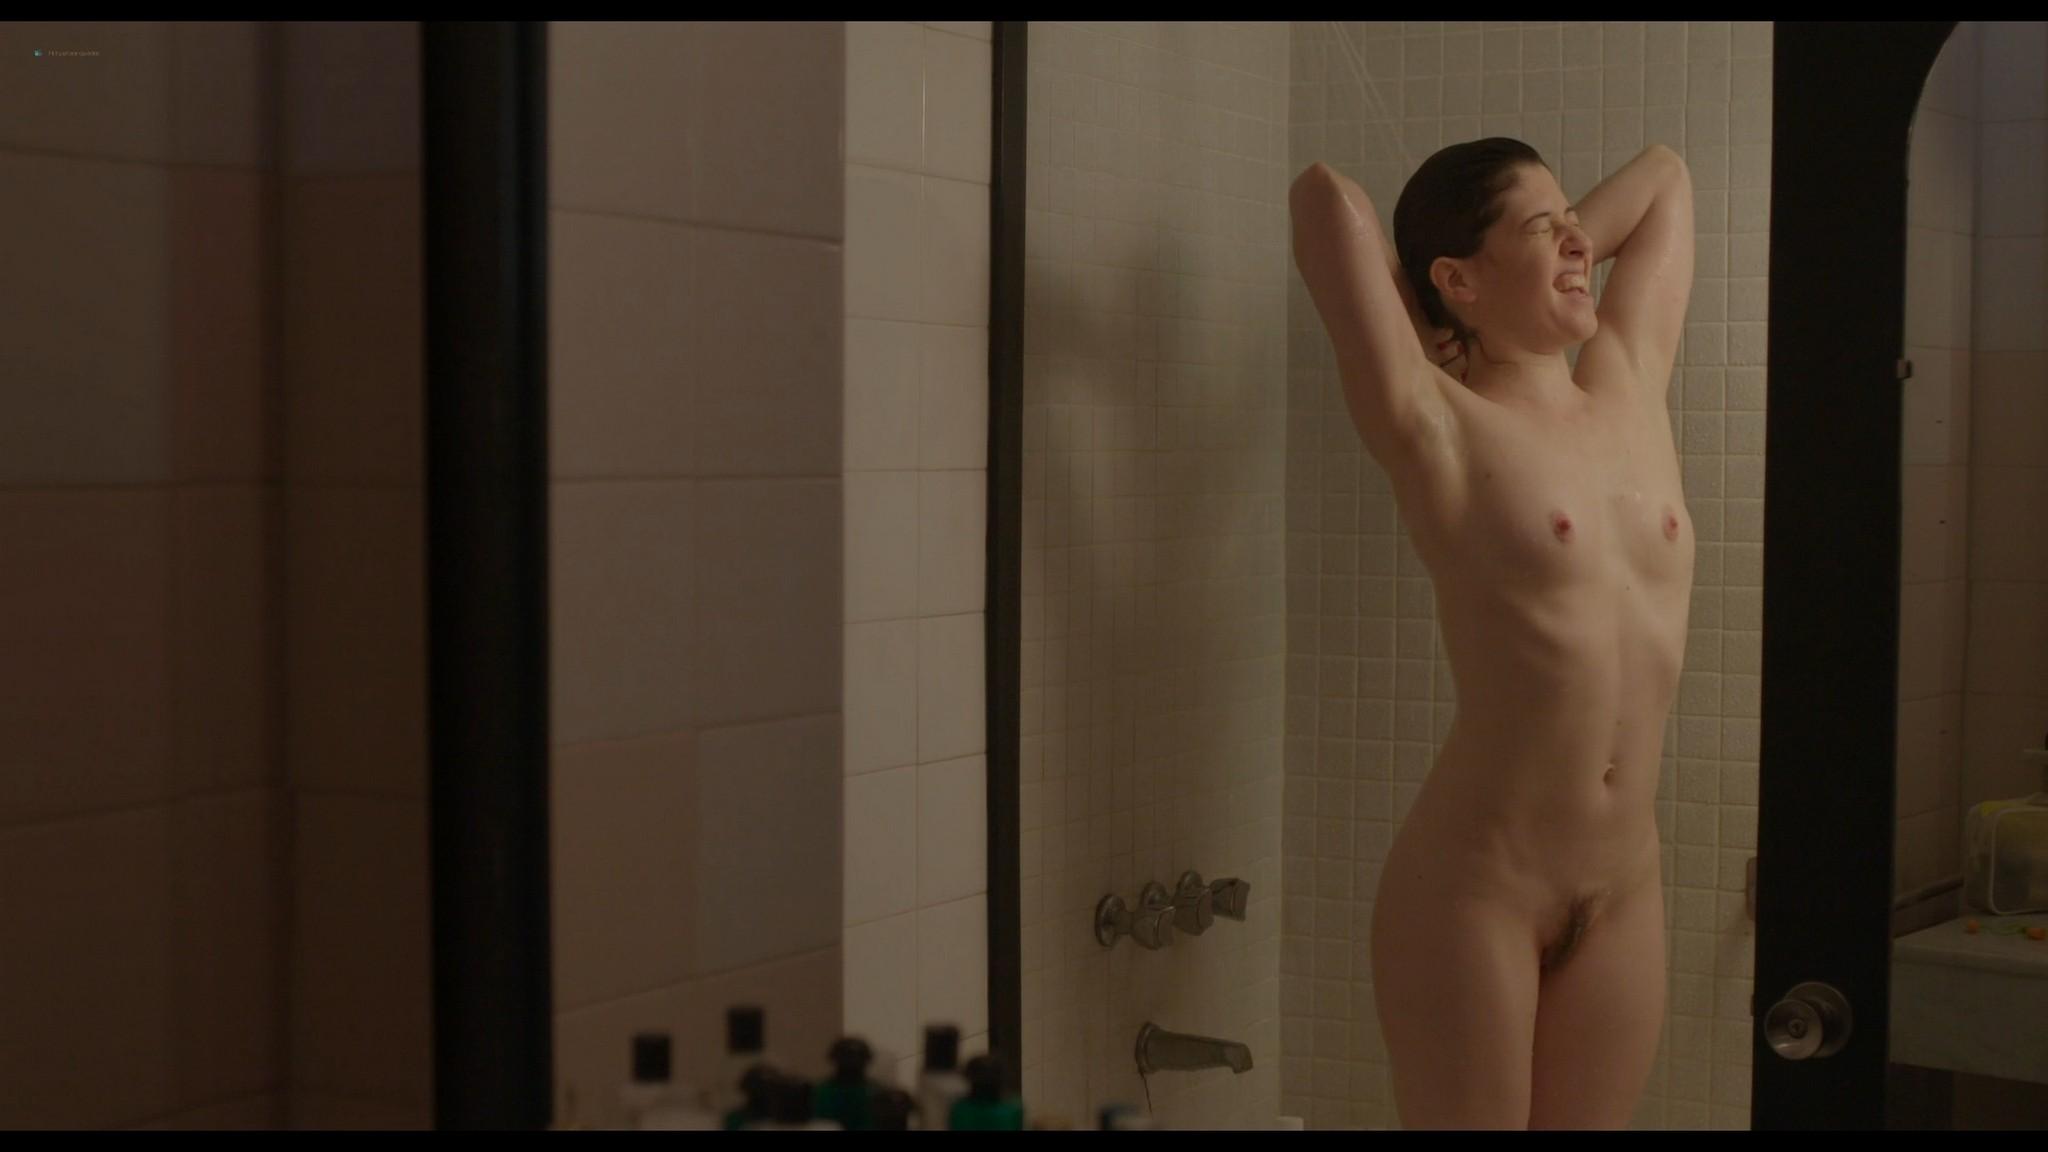 Sofia Gala Castiglione nude explicit Erica Rivas and others nude explicit lesbian sex The Daughters of Fire 2018 1080p Web 2